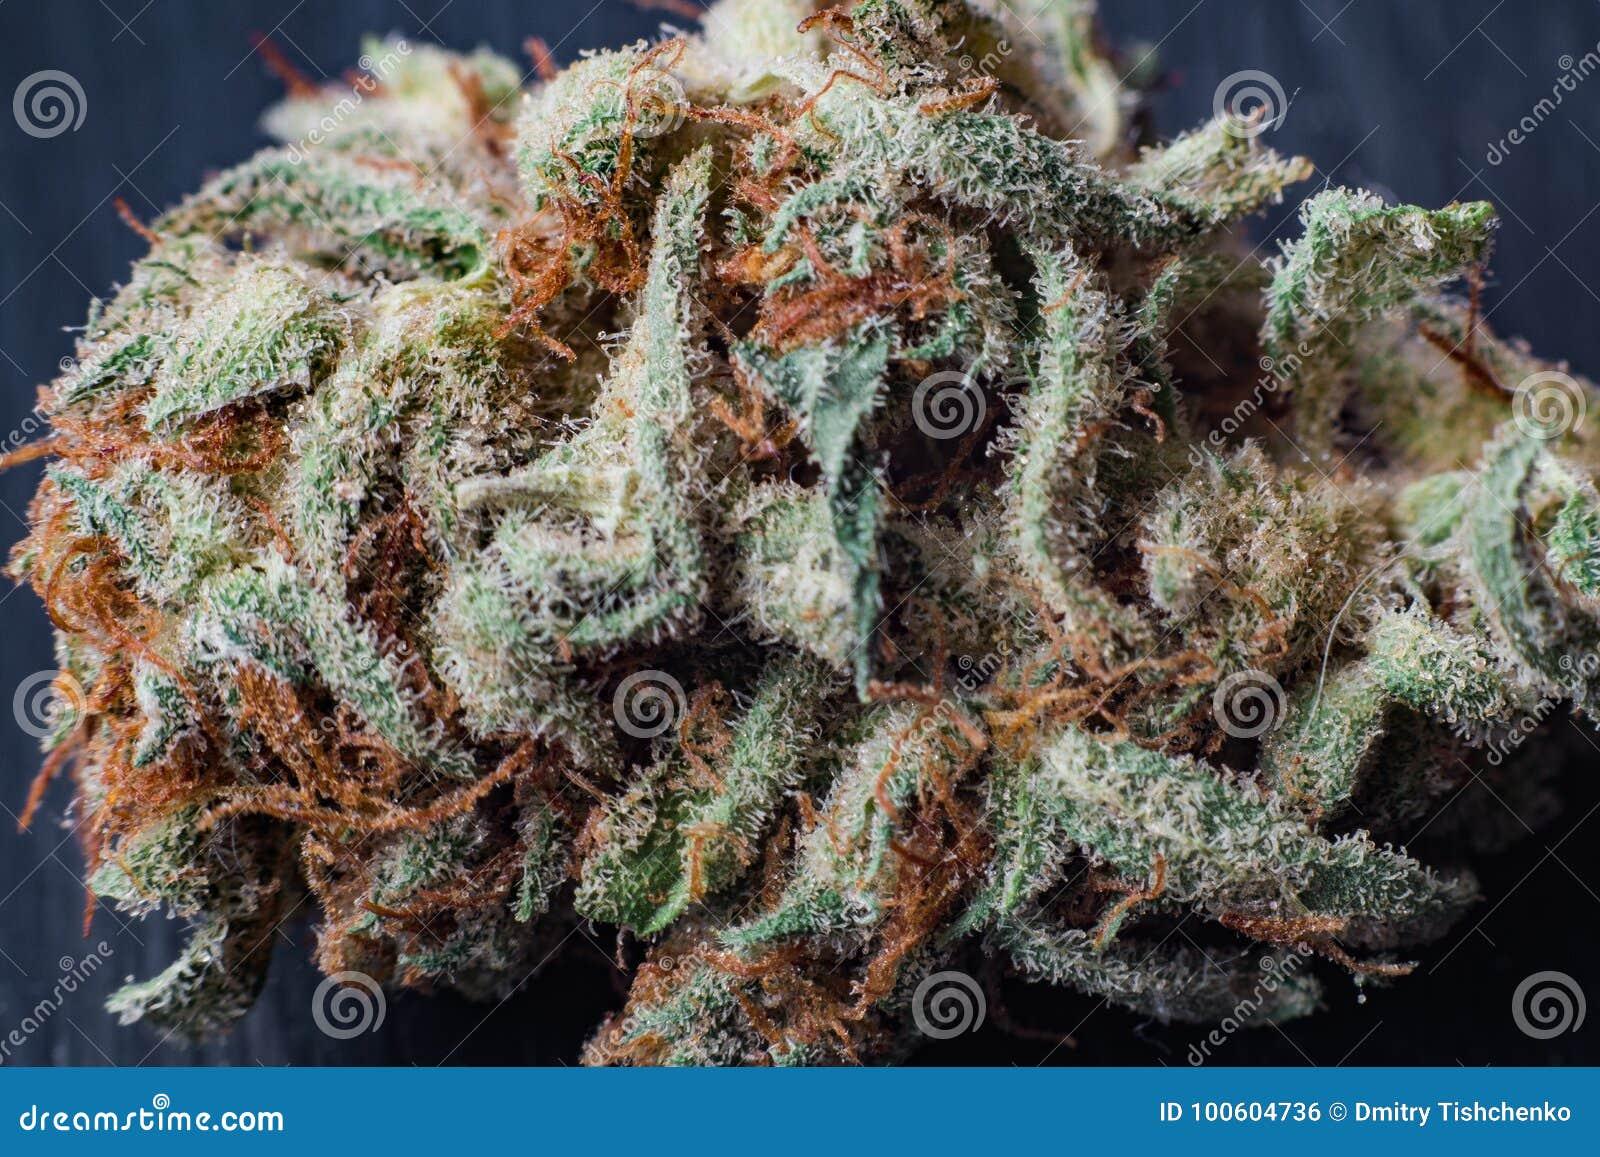 Marijuana, Cannabis Macro Trichomes Thc Flower Sativa Critical Never